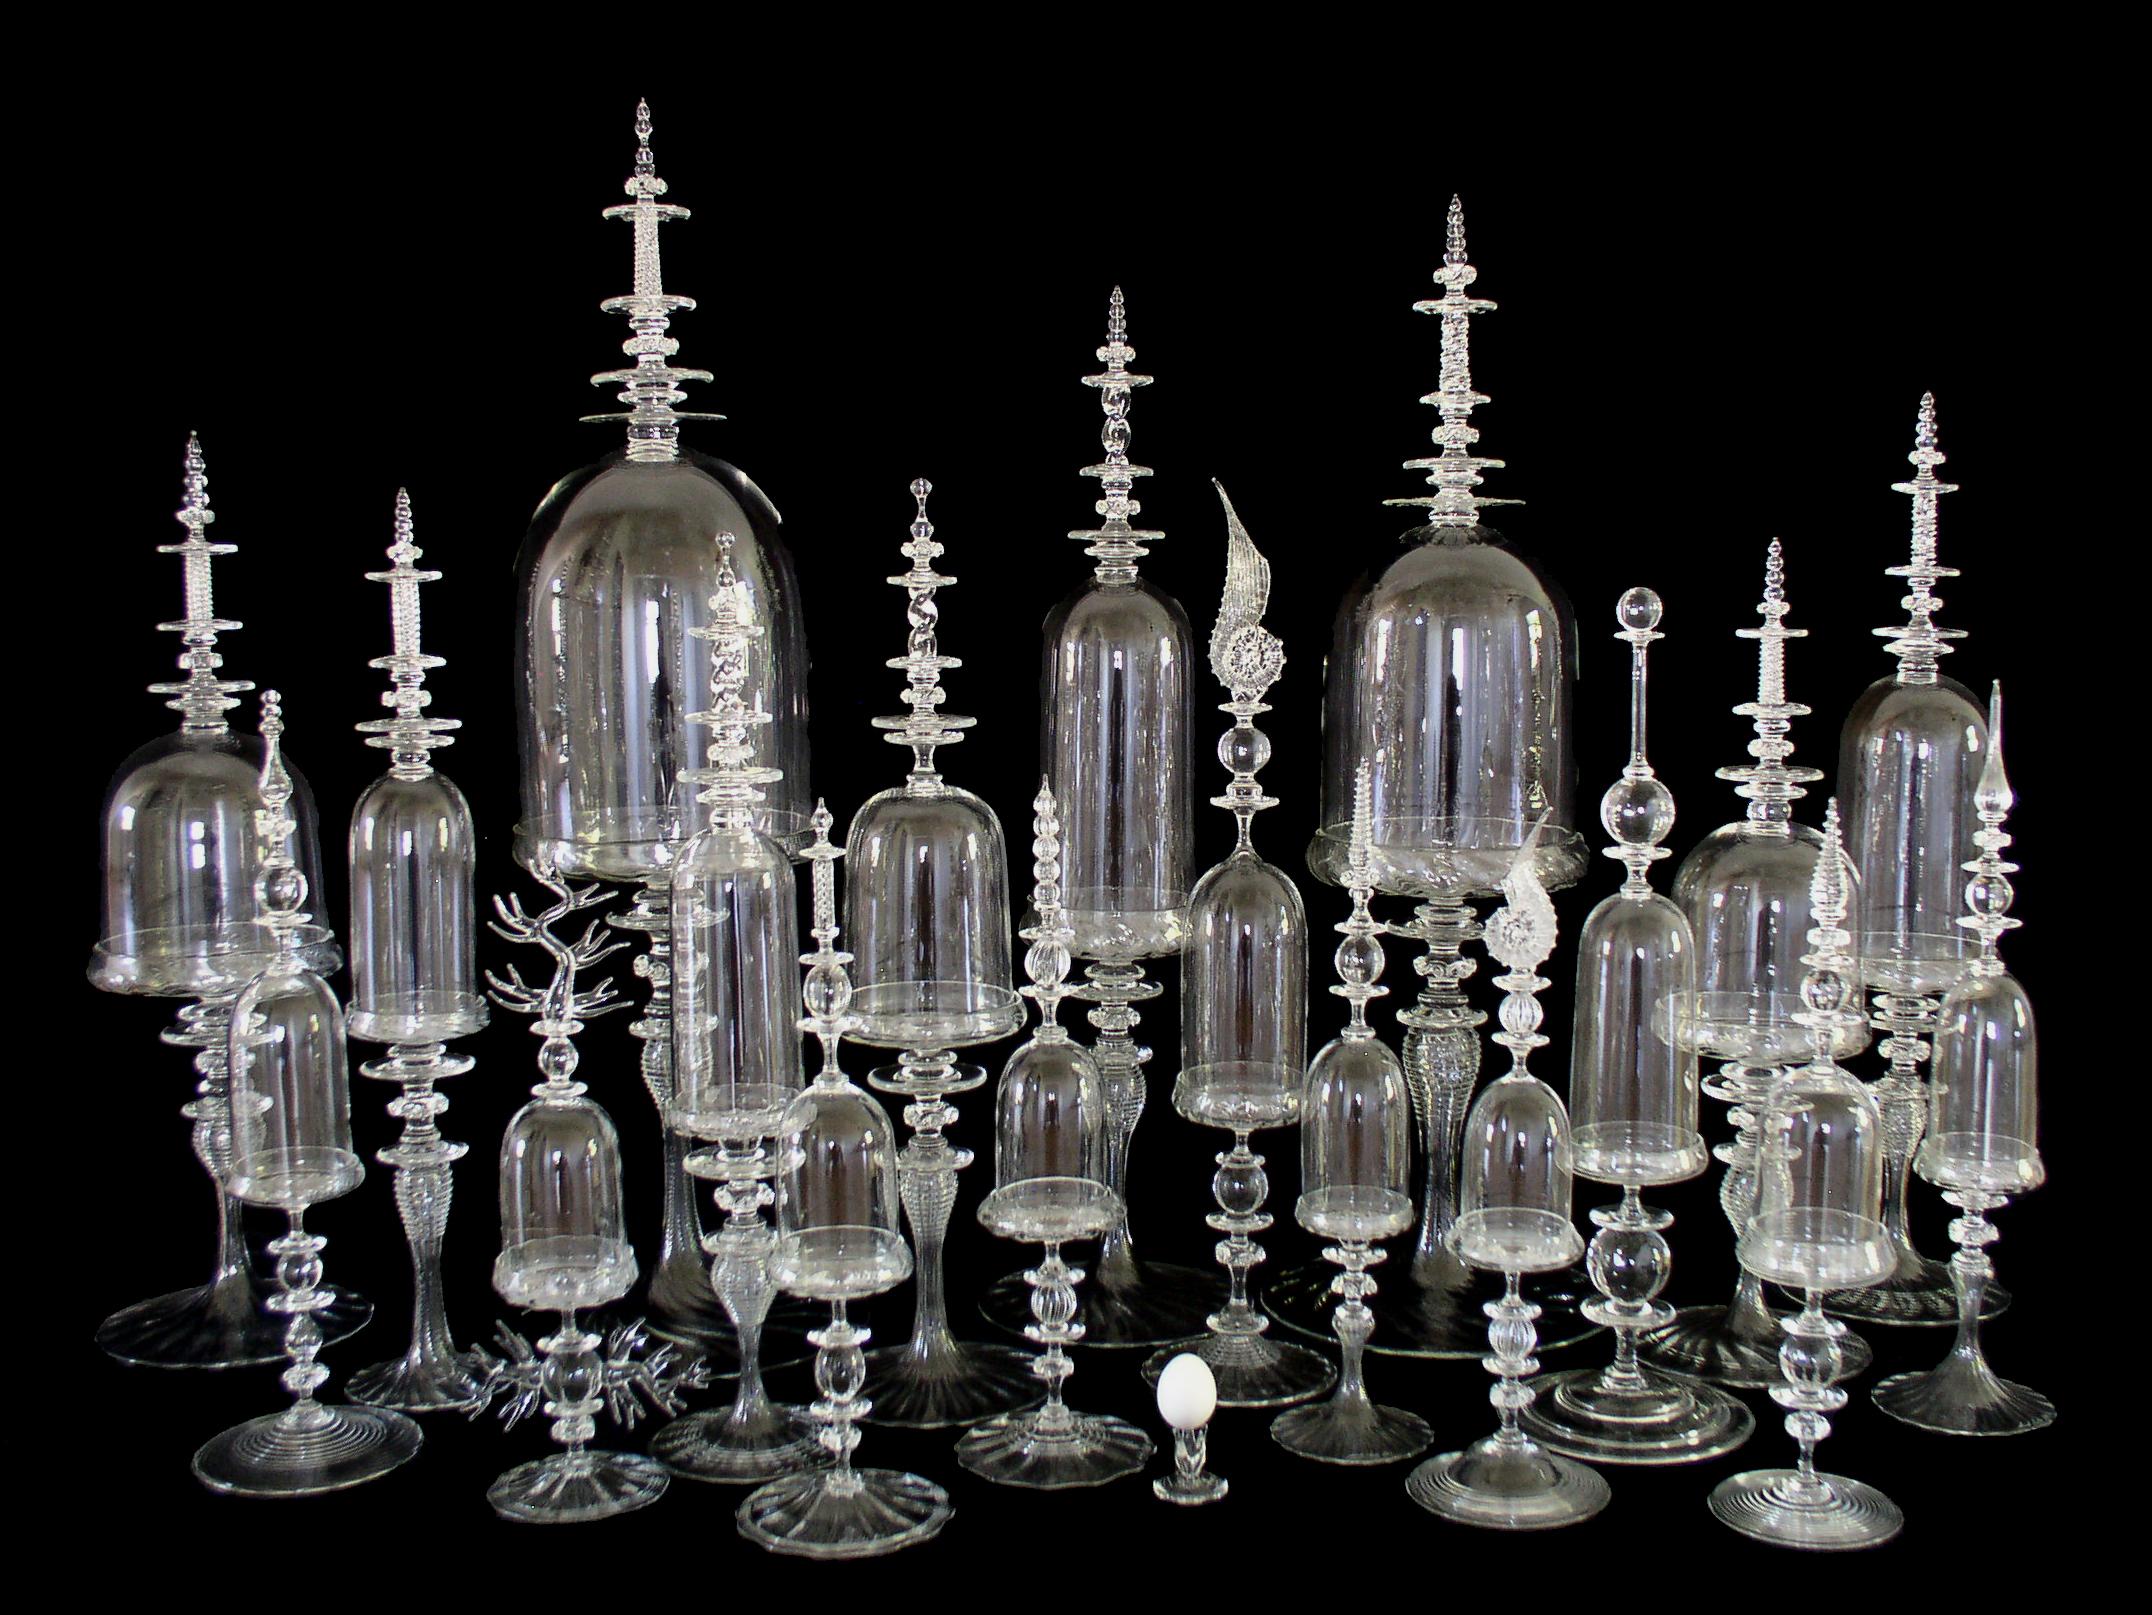 bell jars all